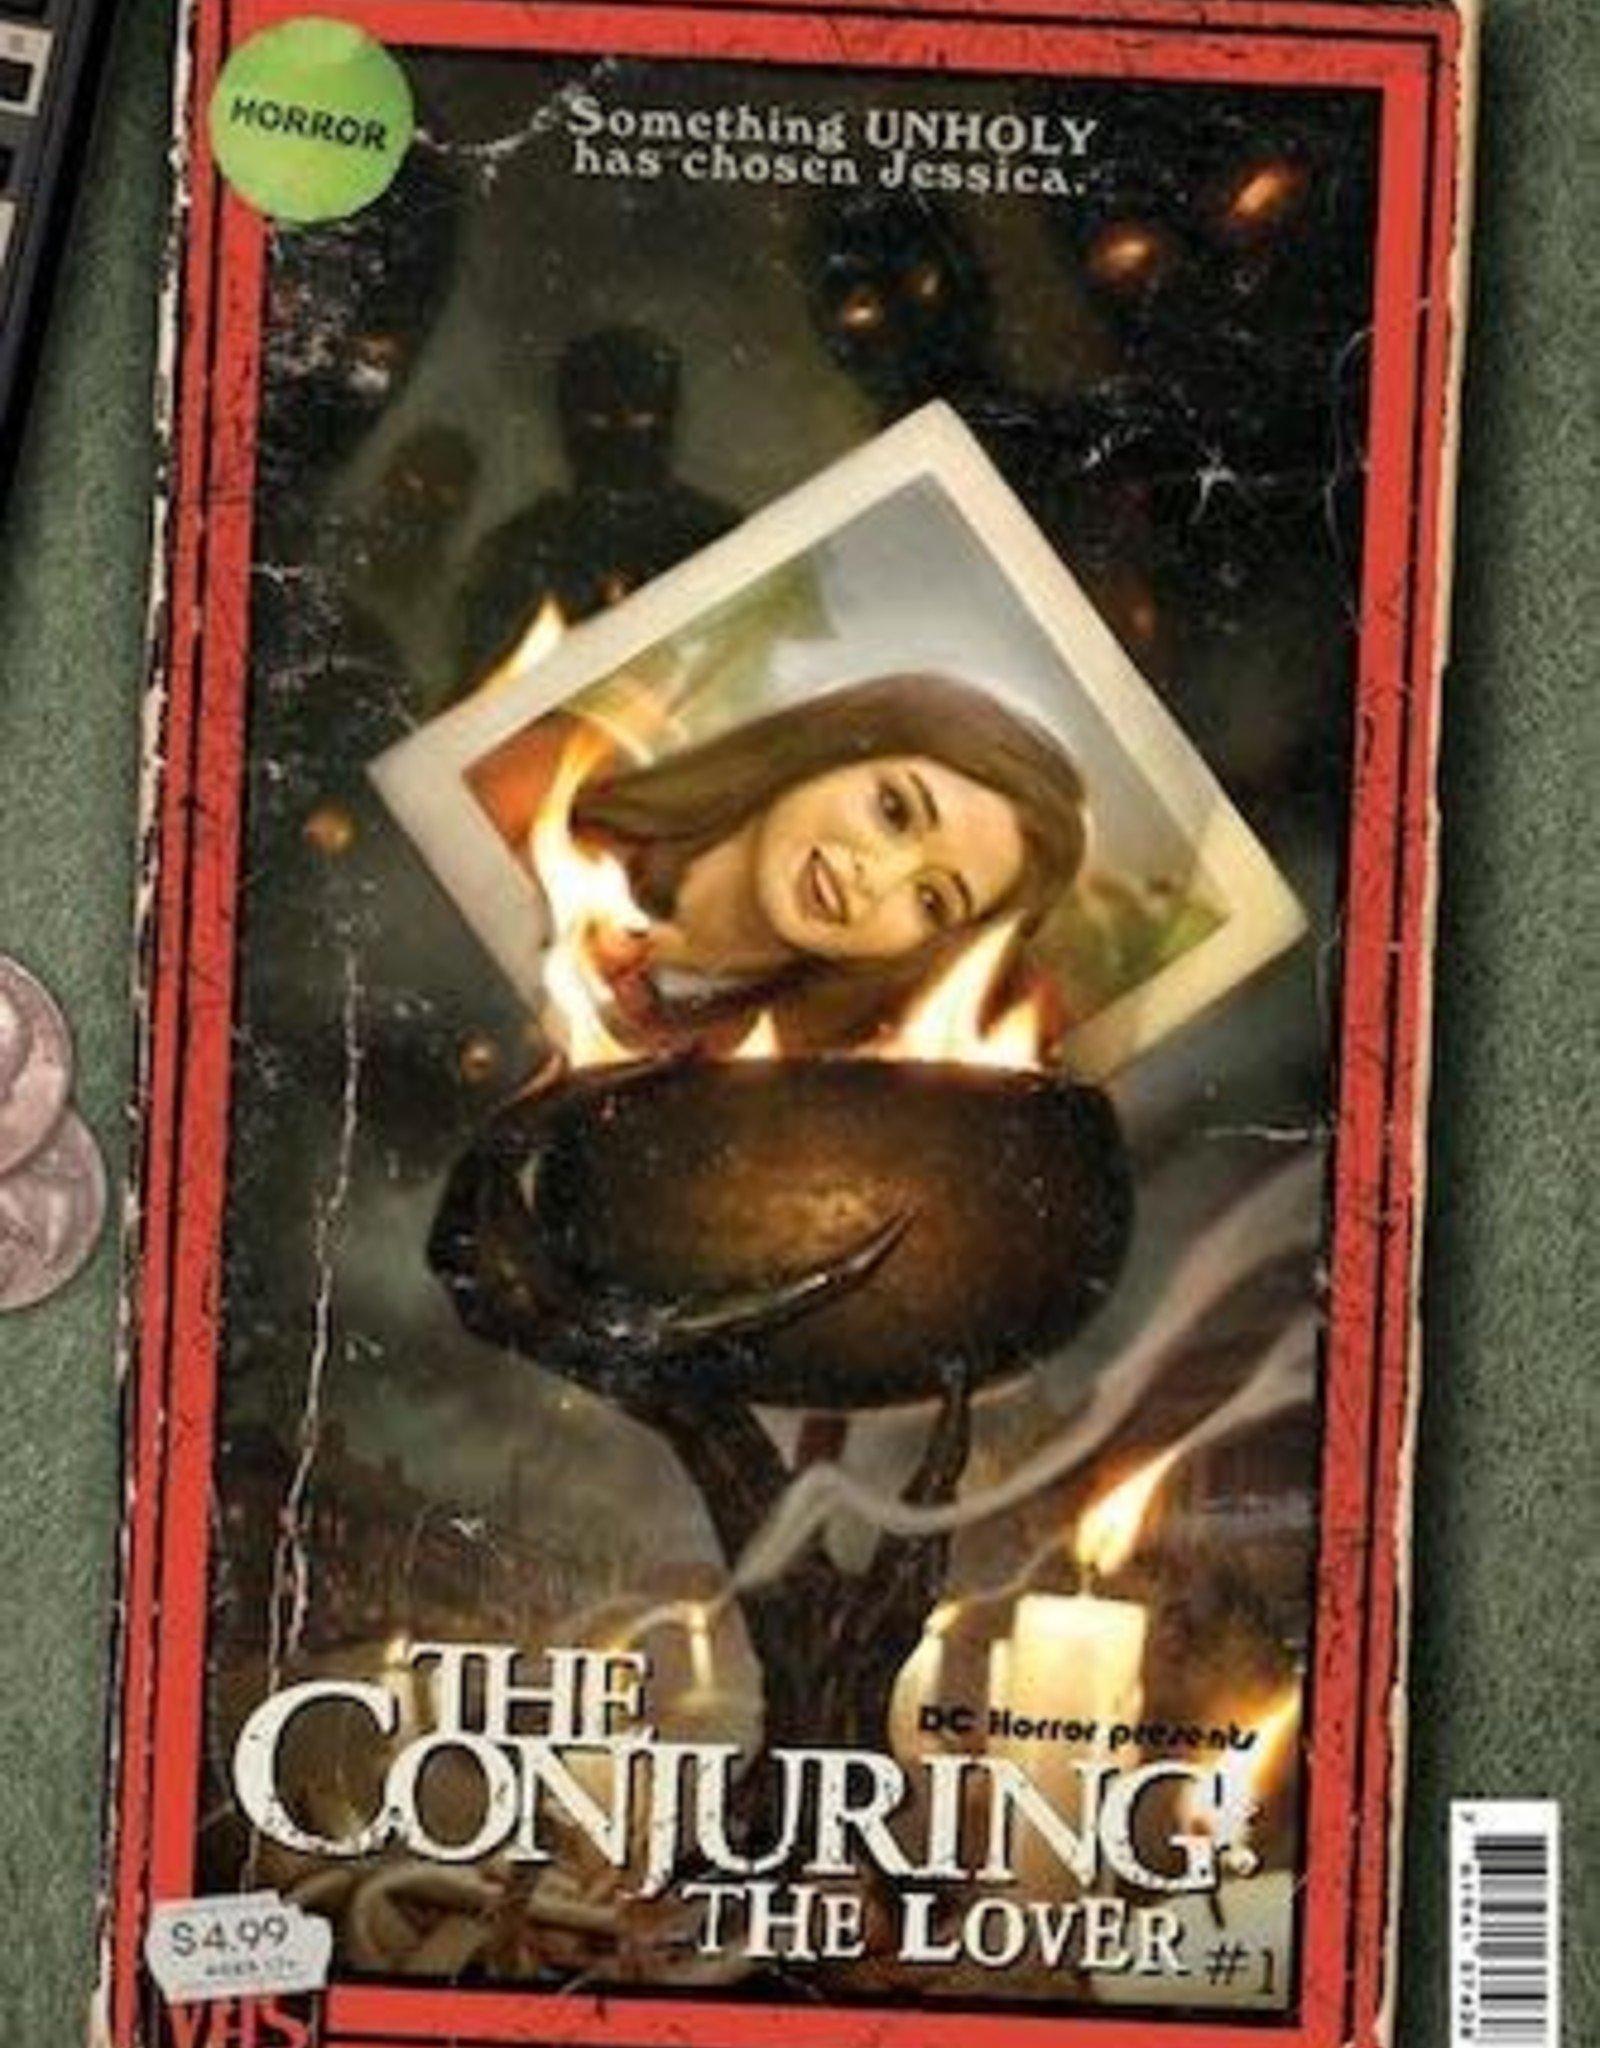 DC Comics DC Horror Presents The Conjuring The Lover #1 Cvr B Ryan Brown Vhs Tribute Card Stock Var